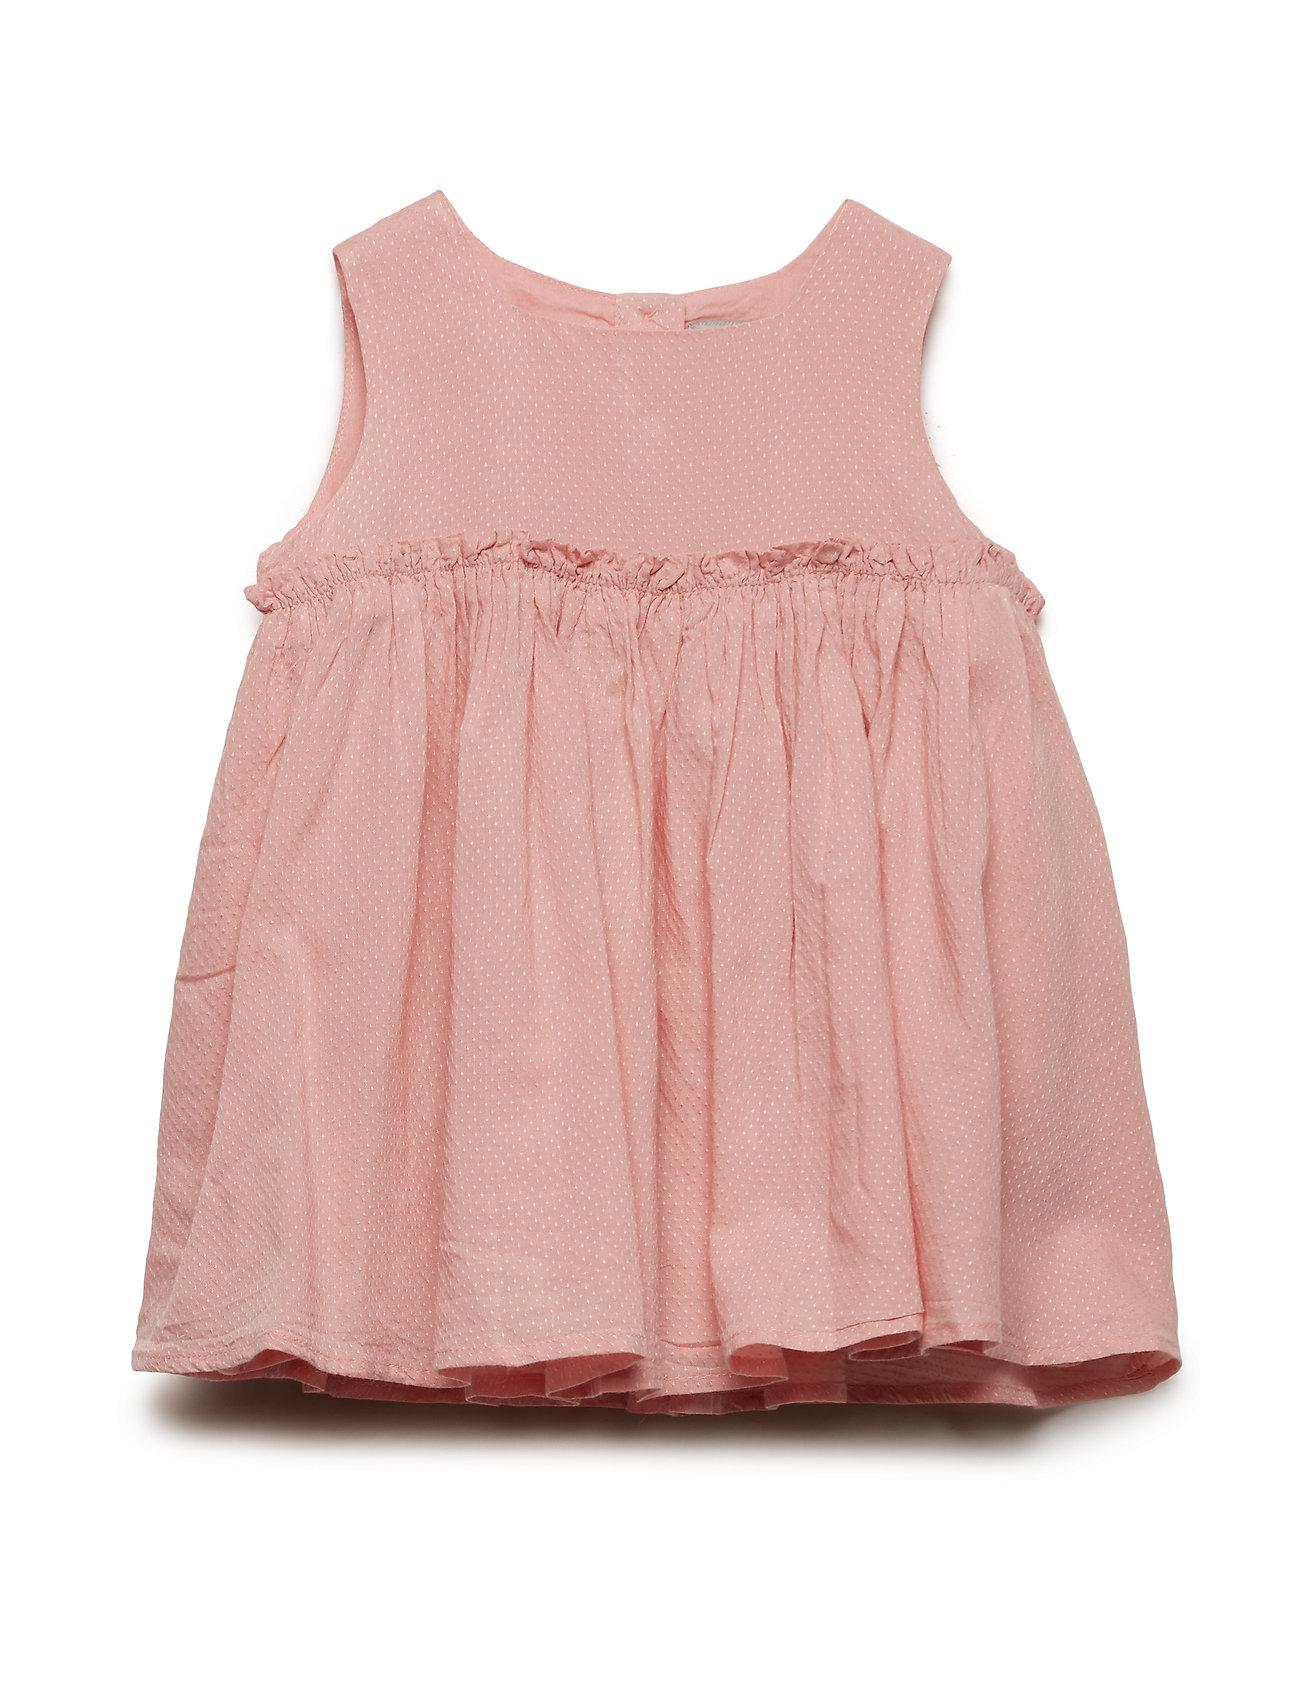 Wheat Dress Camilla - ROSE TAN